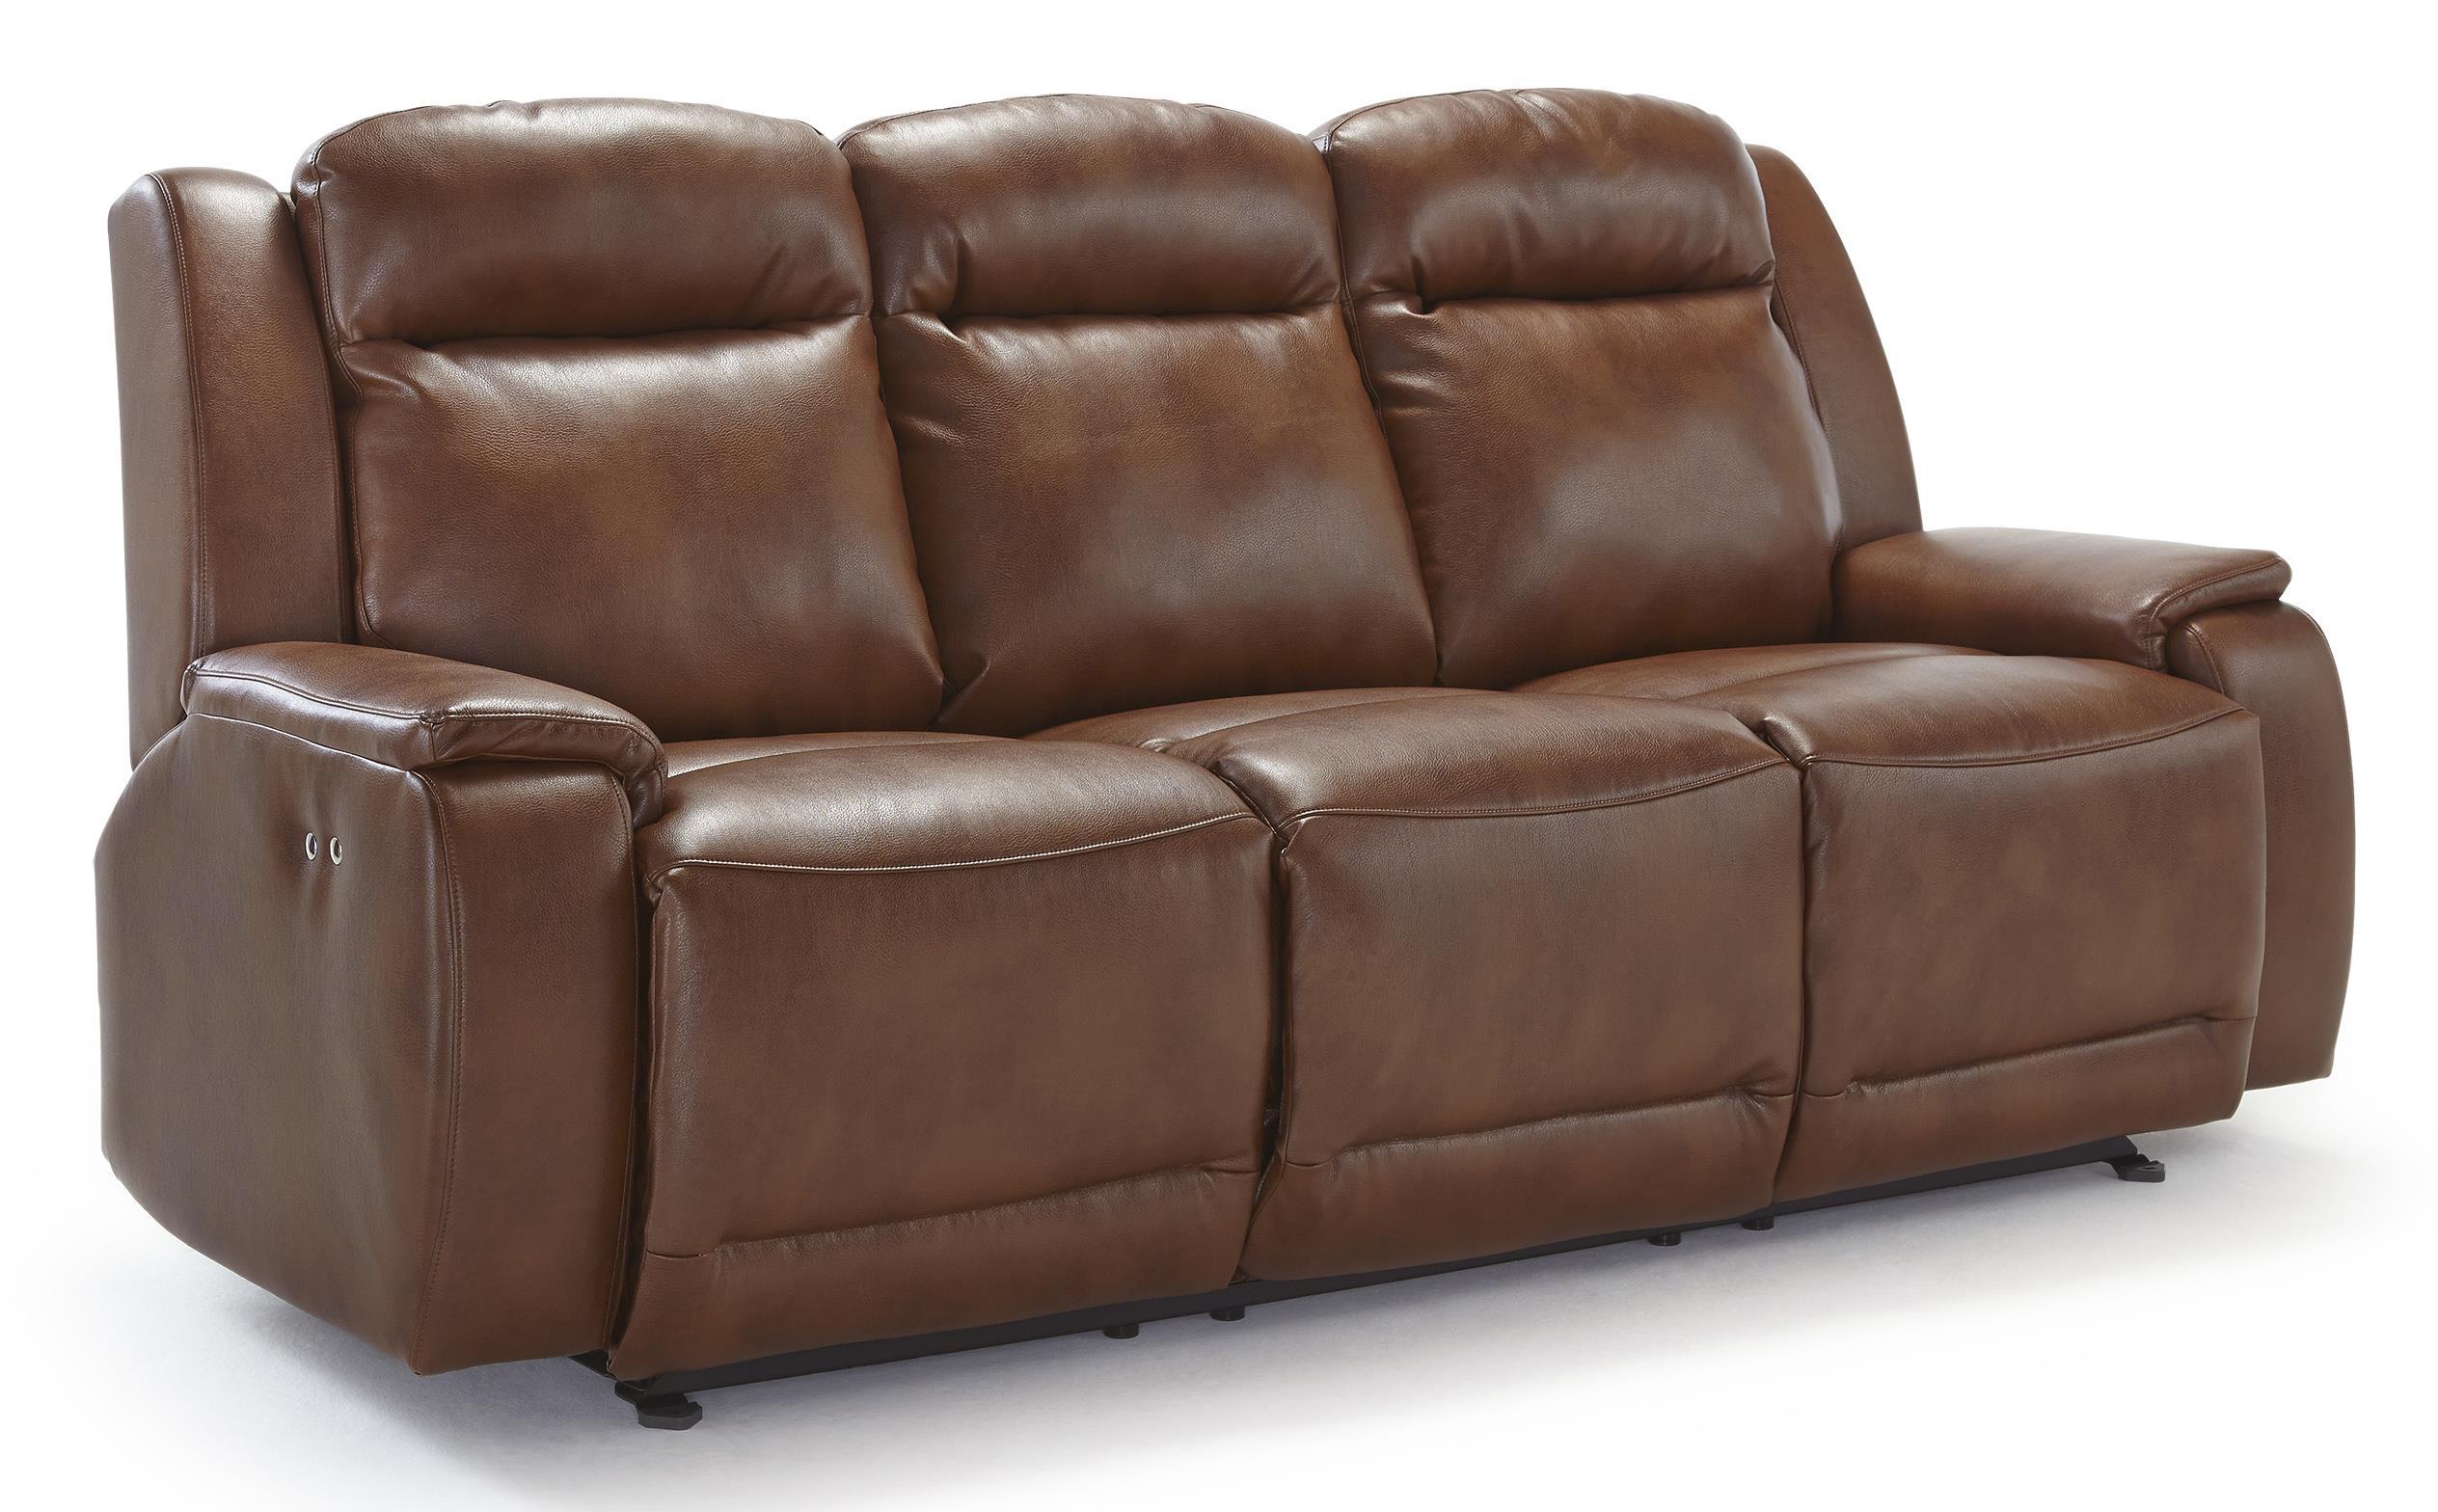 Best Home Furnishings Hardisty Power Reclining Sofa - Item Number: S680UP4U-26764U